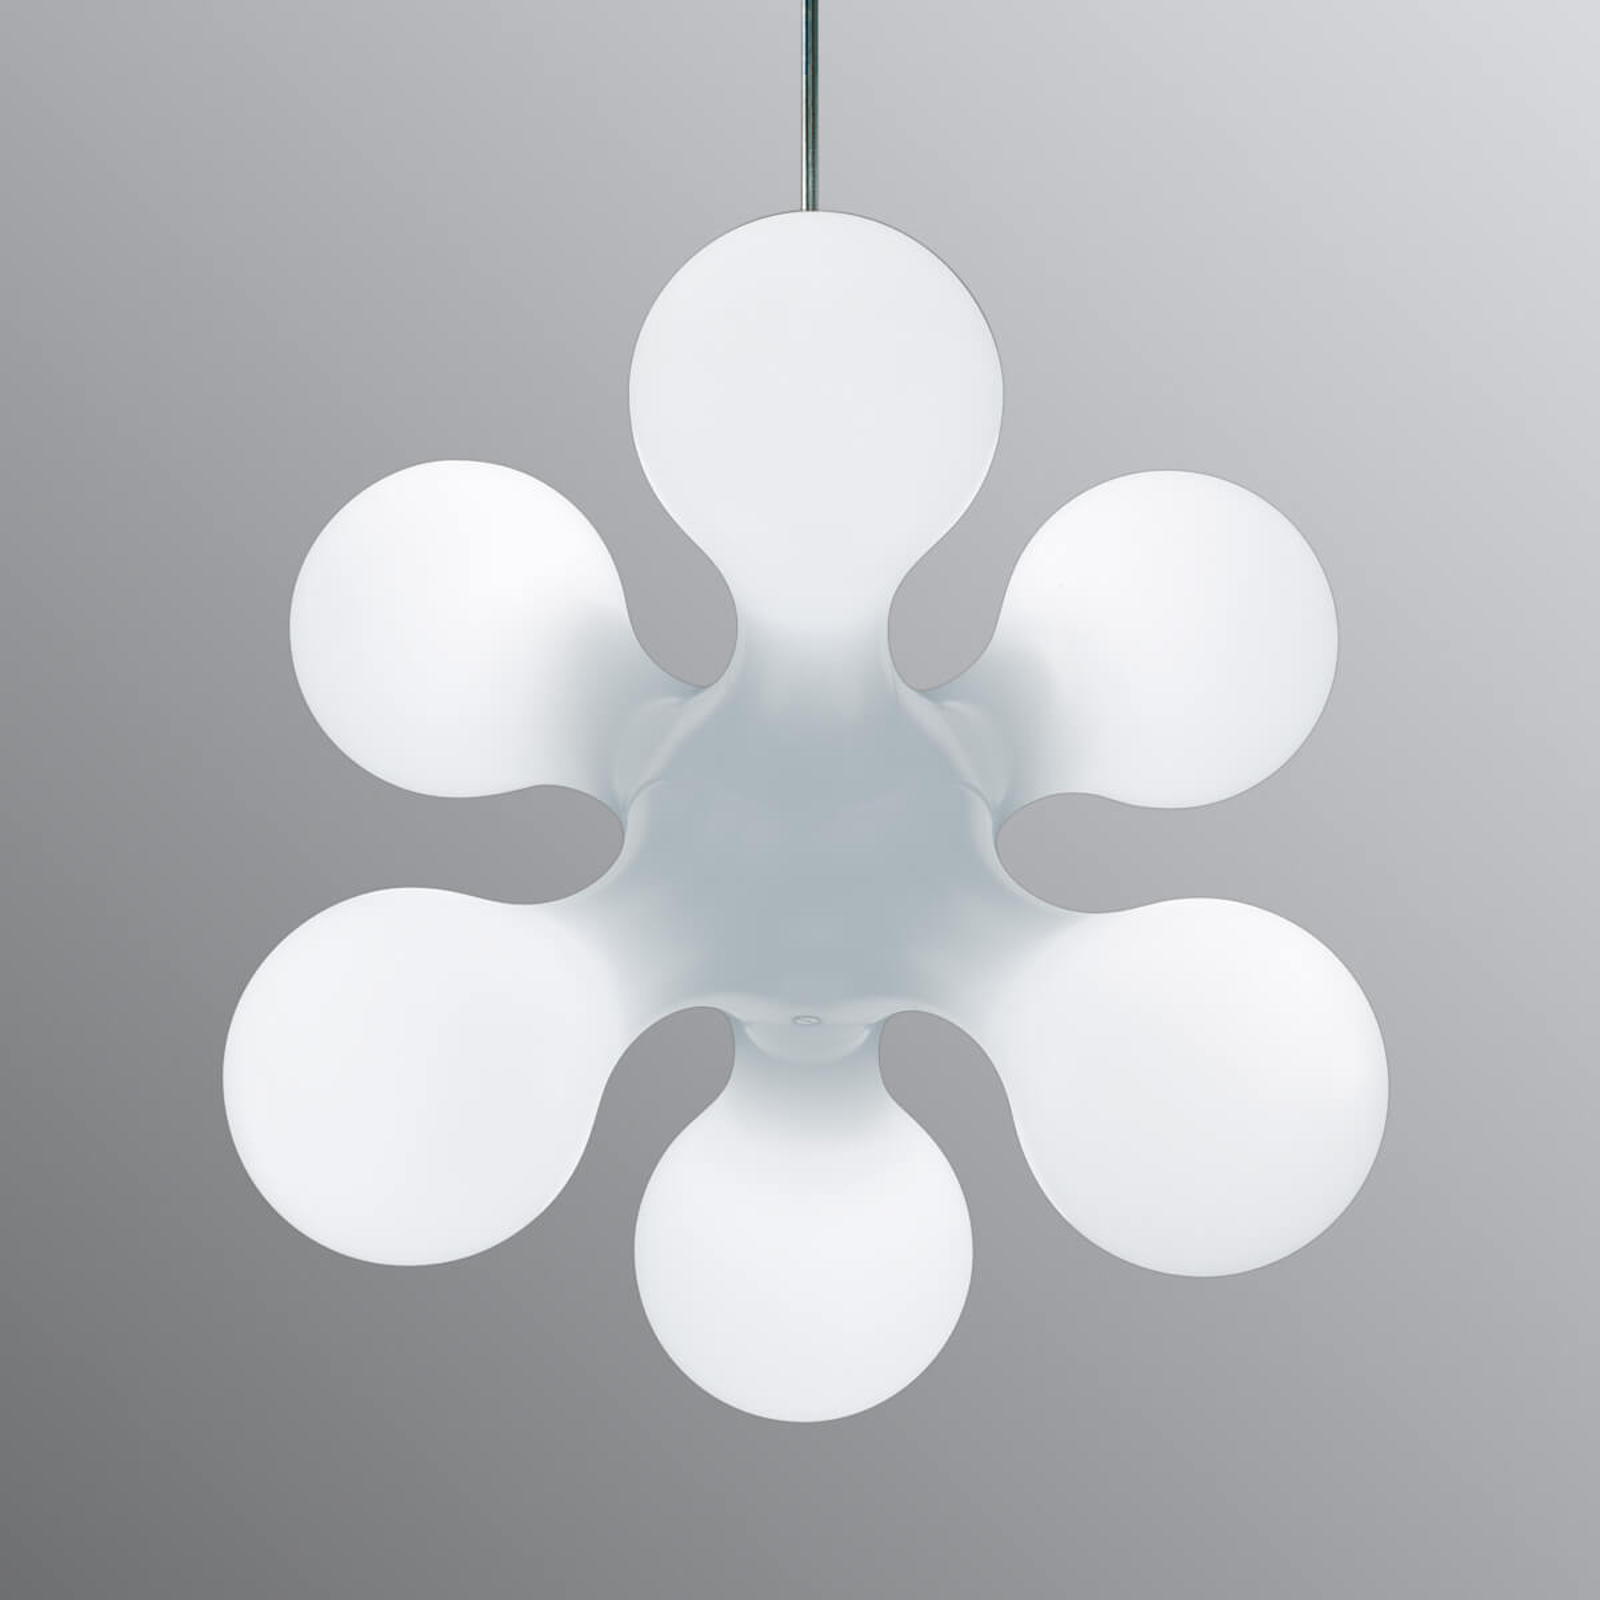 Stylowa designerska lampa wisząca RON Atomium